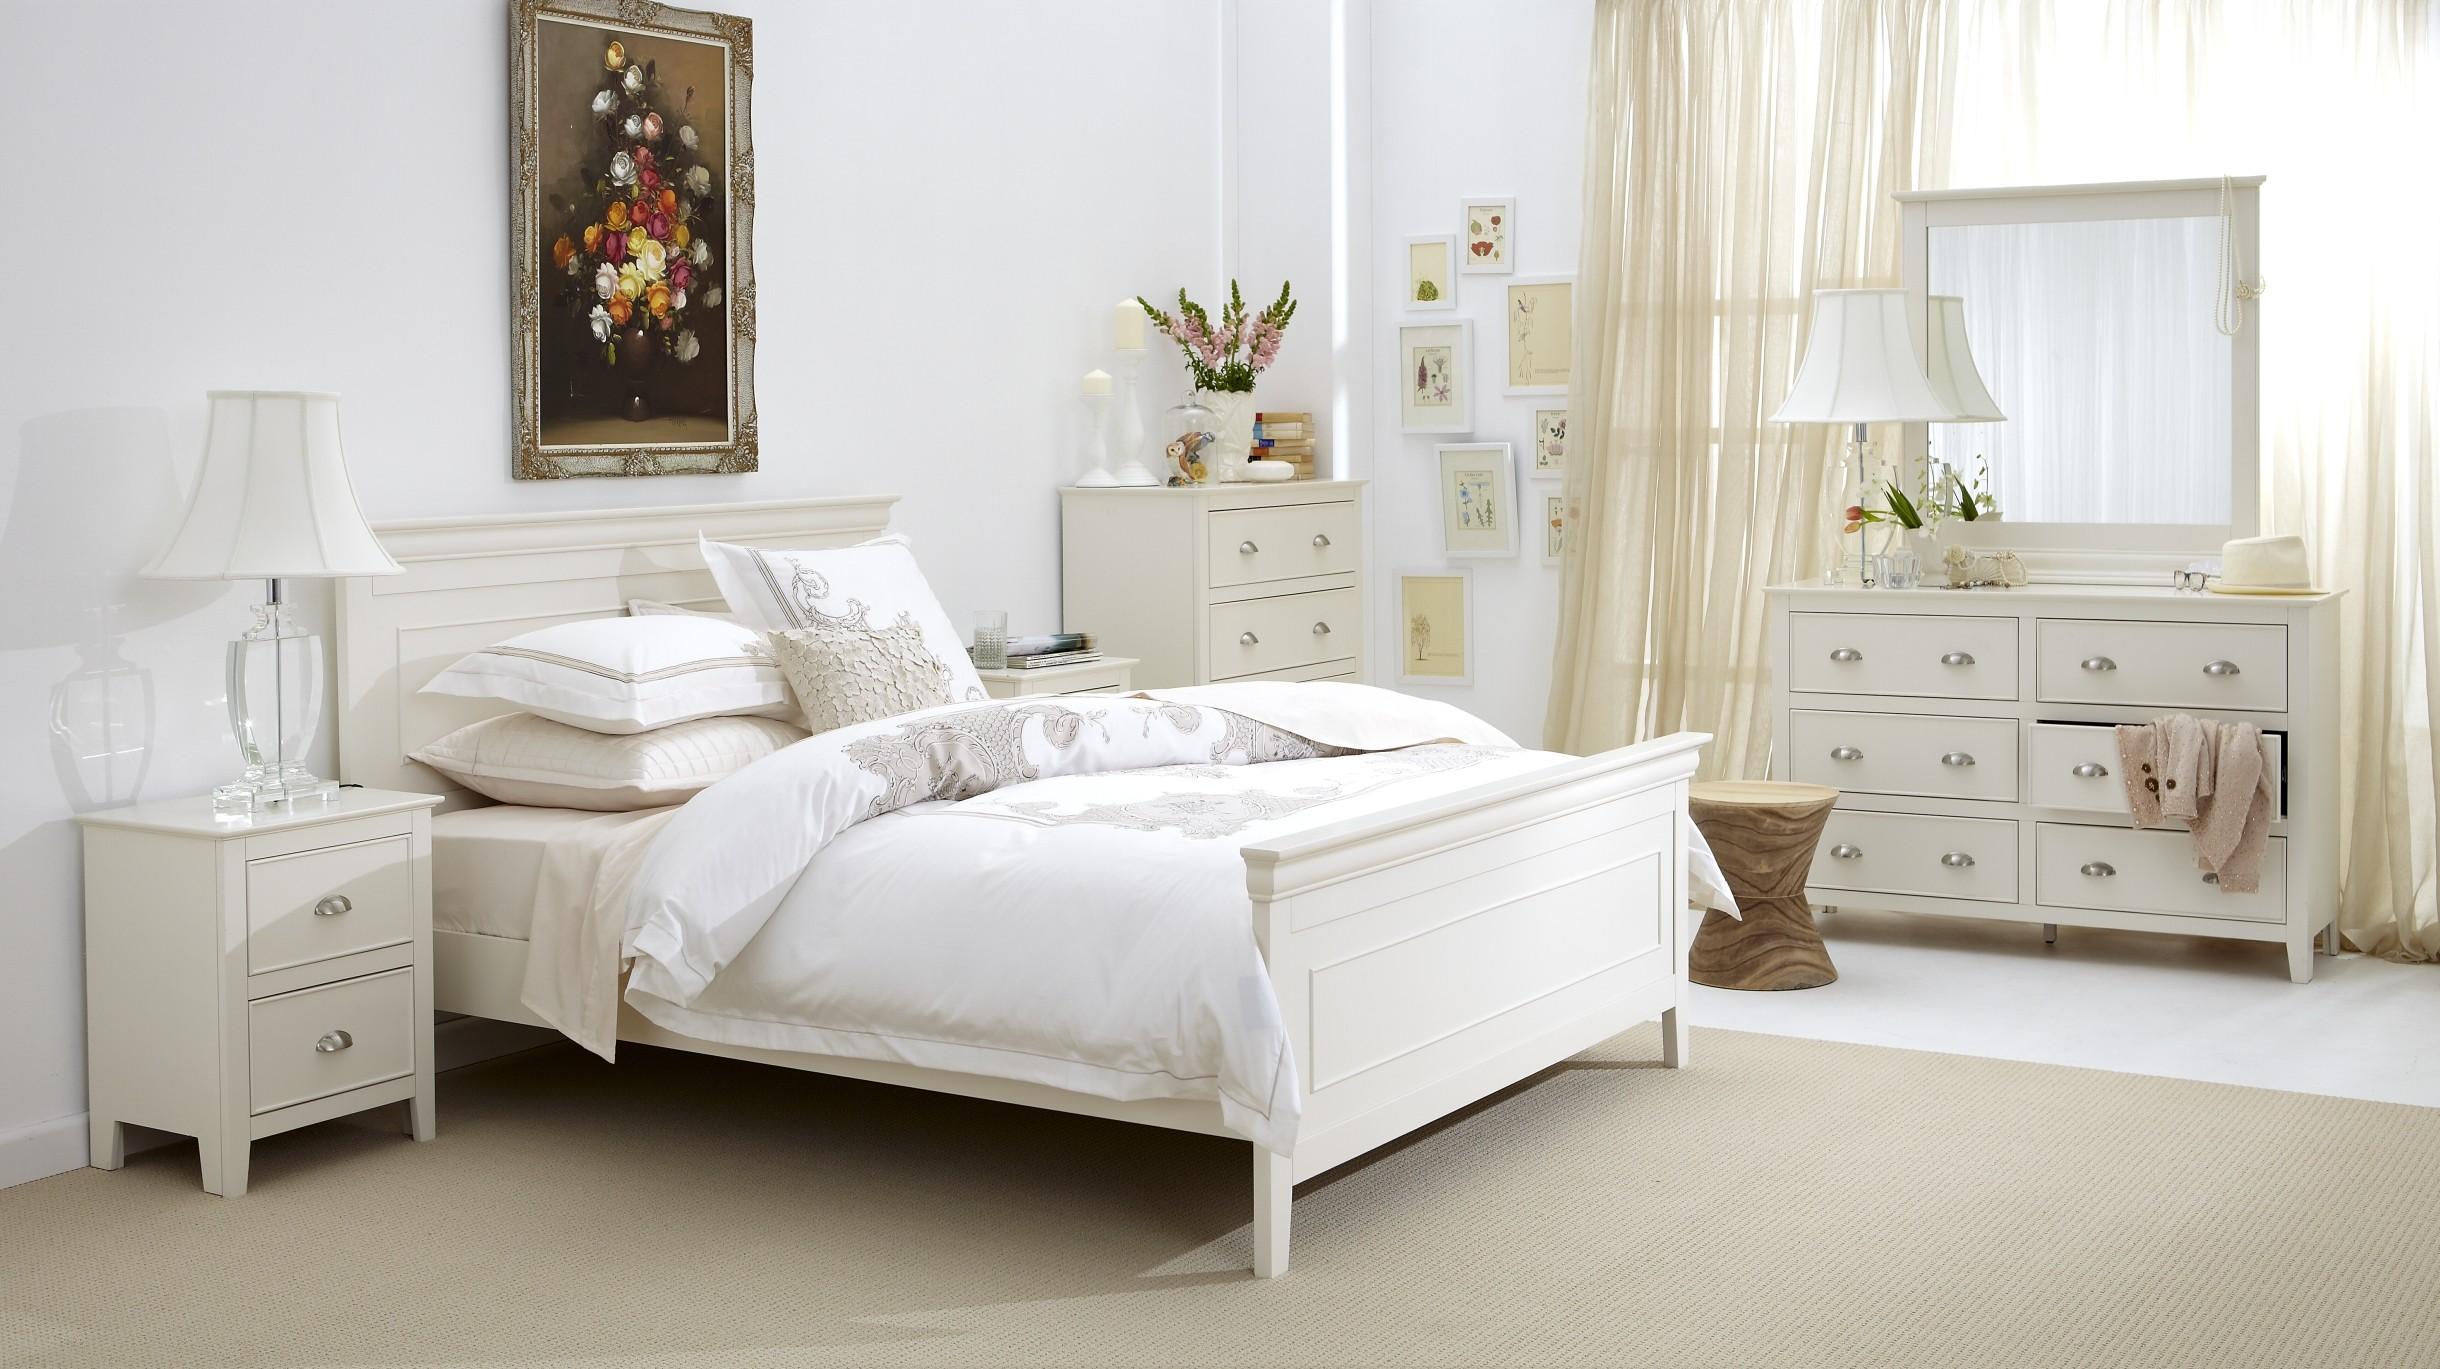 white bedroom furniture decorating ideas photo - 3